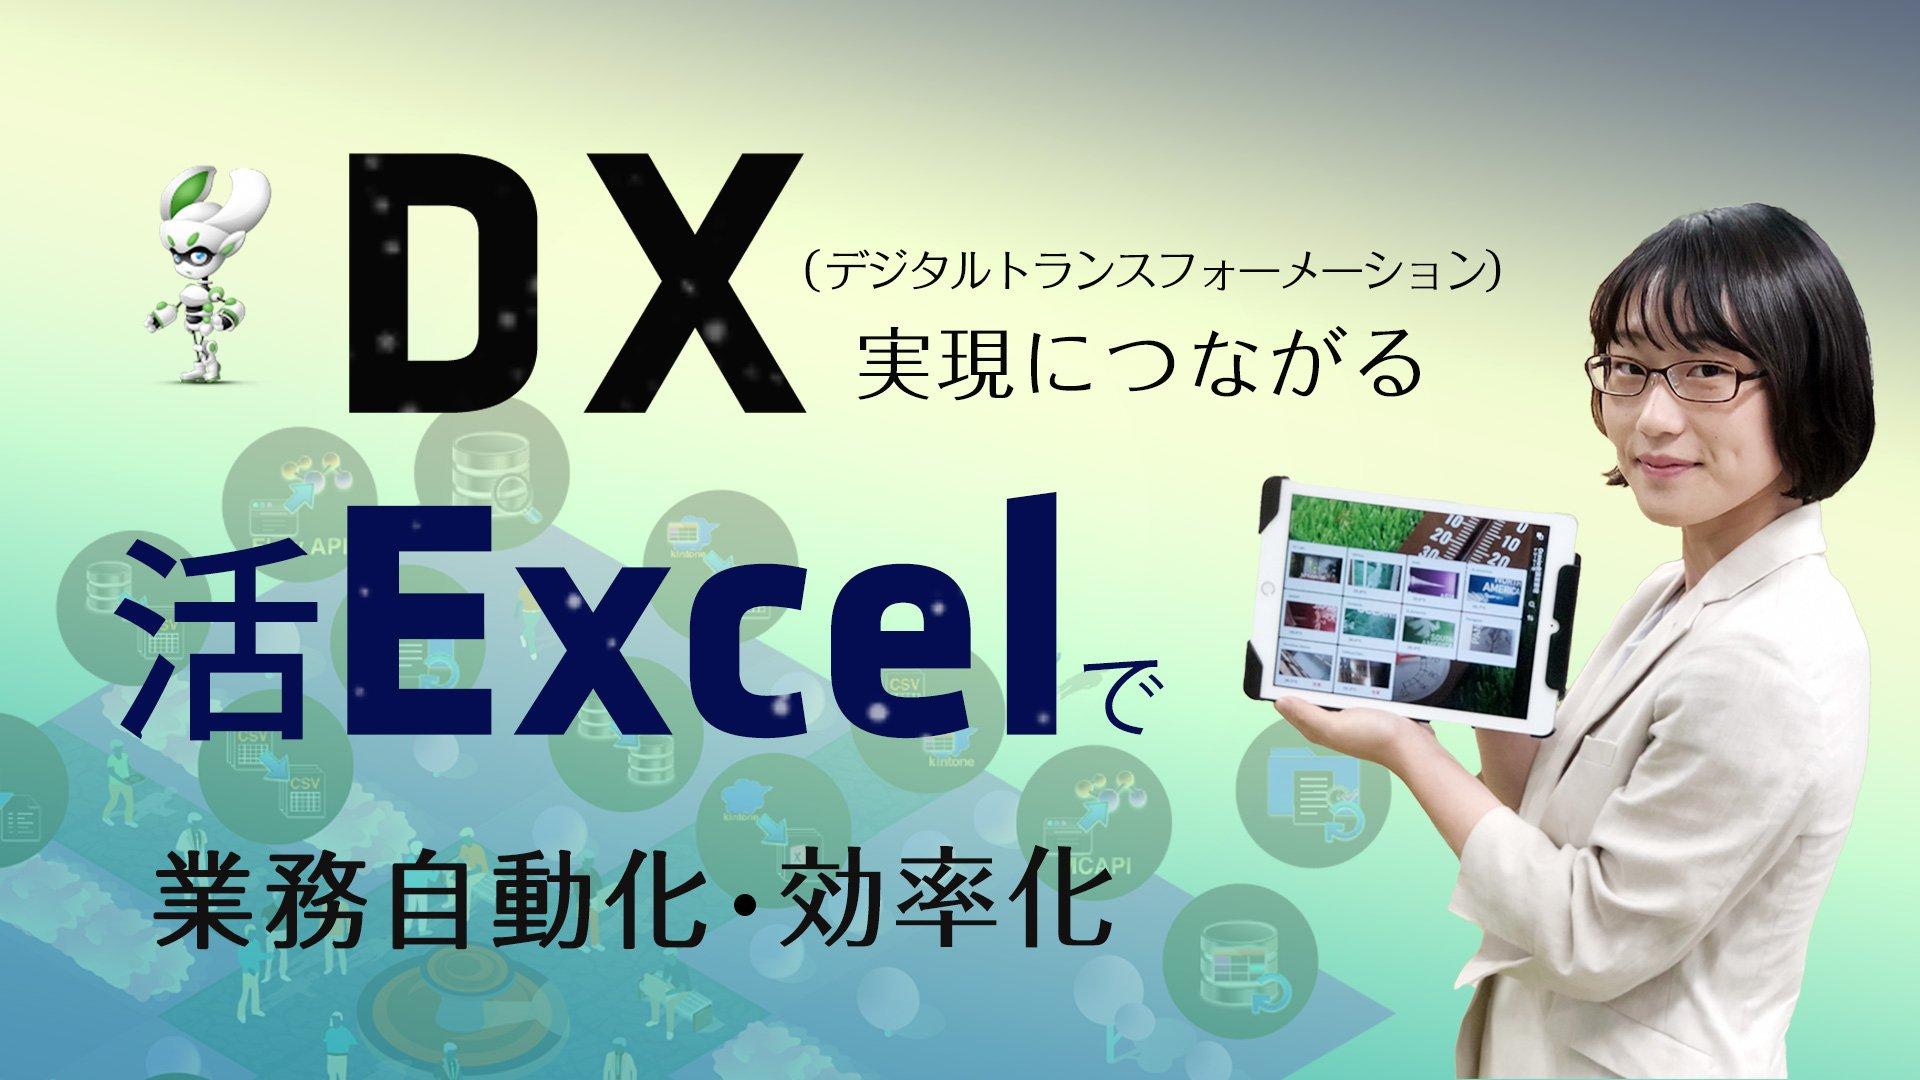 DX実現につながる!活Excelで業務自動化・効率化